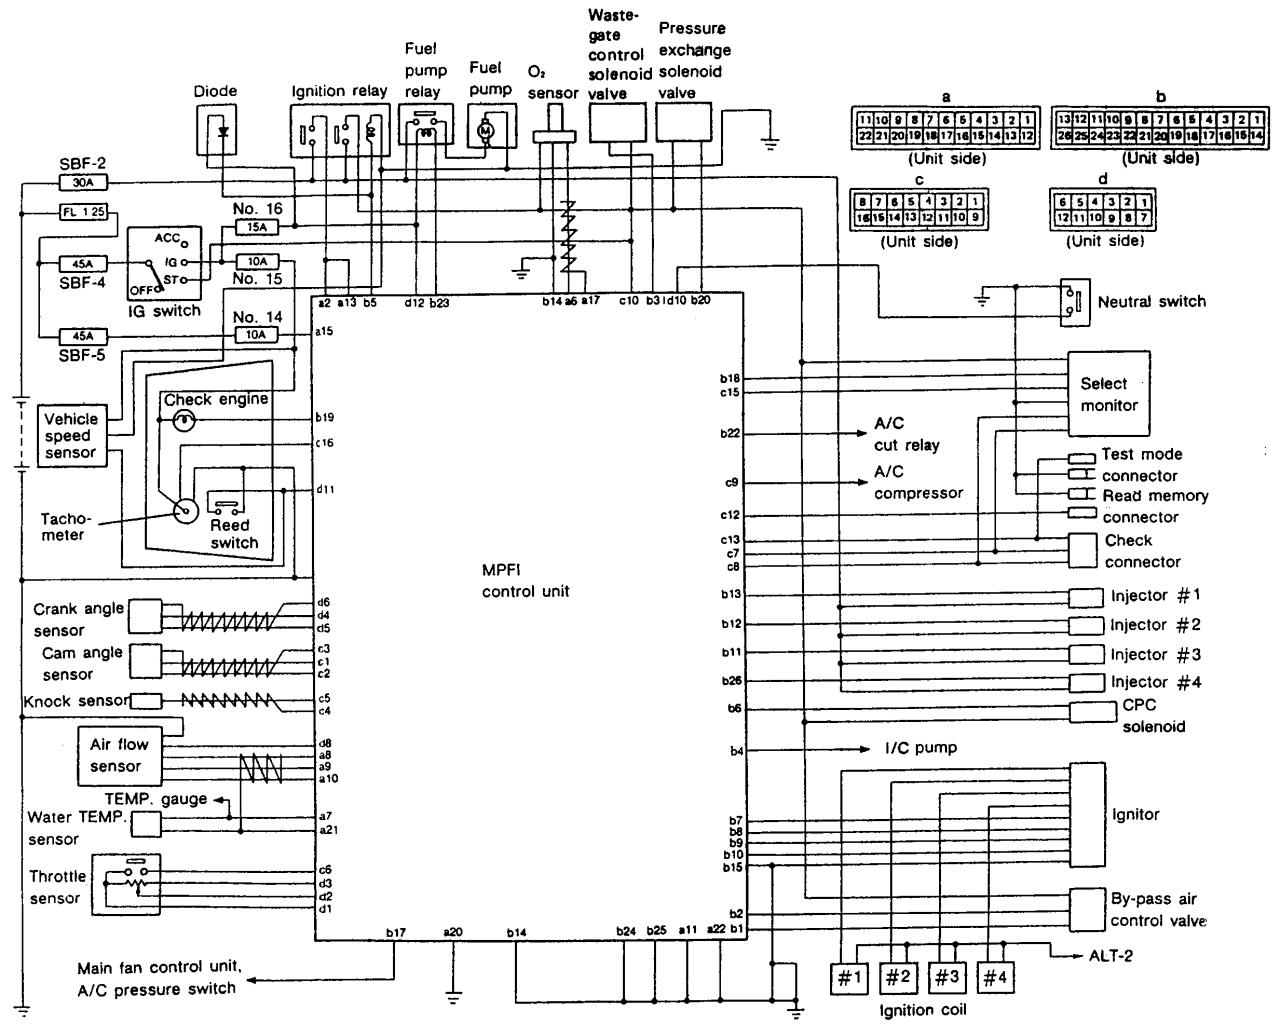 2011 subaru outback headlight wiring diagram subaru outback diagram of 91 wiring diagram data  subaru outback diagram of 91 wiring